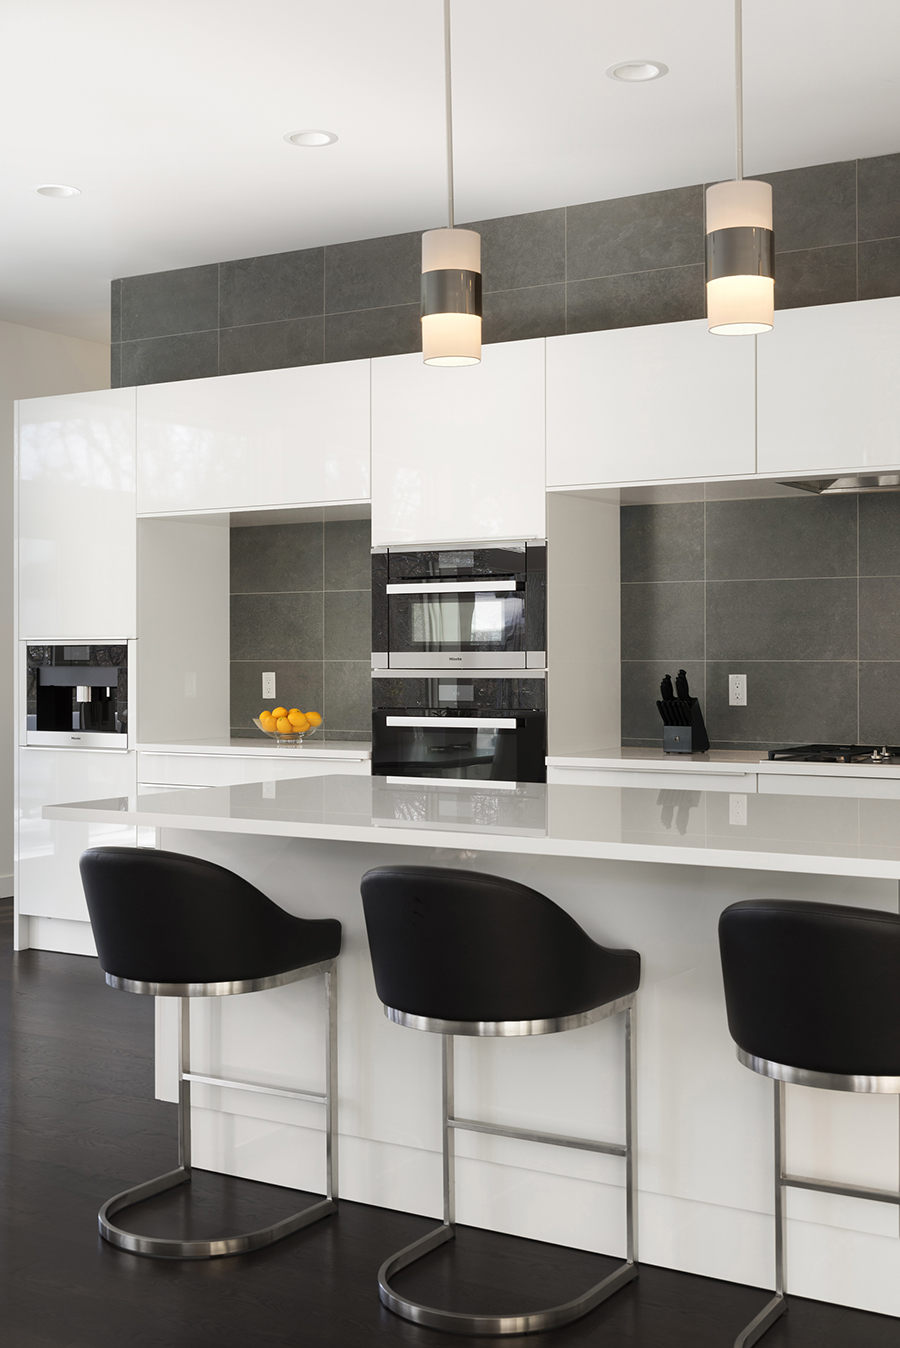 Belle Kitchen Interior Design Designer Luxury Minnesota MN Mpls Minneapolis St Paul Twin Cities3.jpg